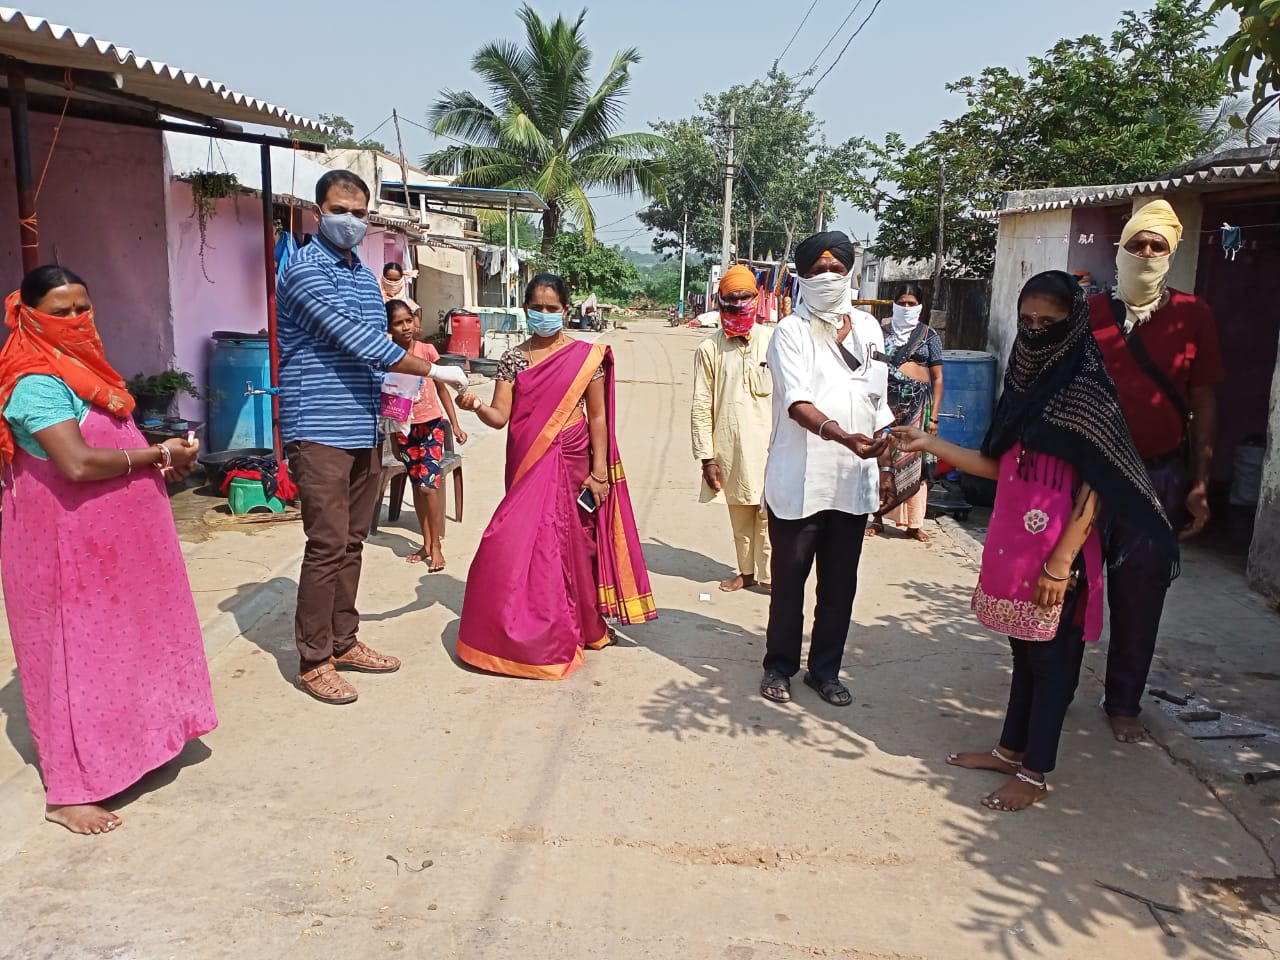 IEC poster sticking, Rally and Medicine Distribution programme at Madanapalli, Gachubhai thanda. Gachubhai thanda is come under Madanapalli as hamlet village